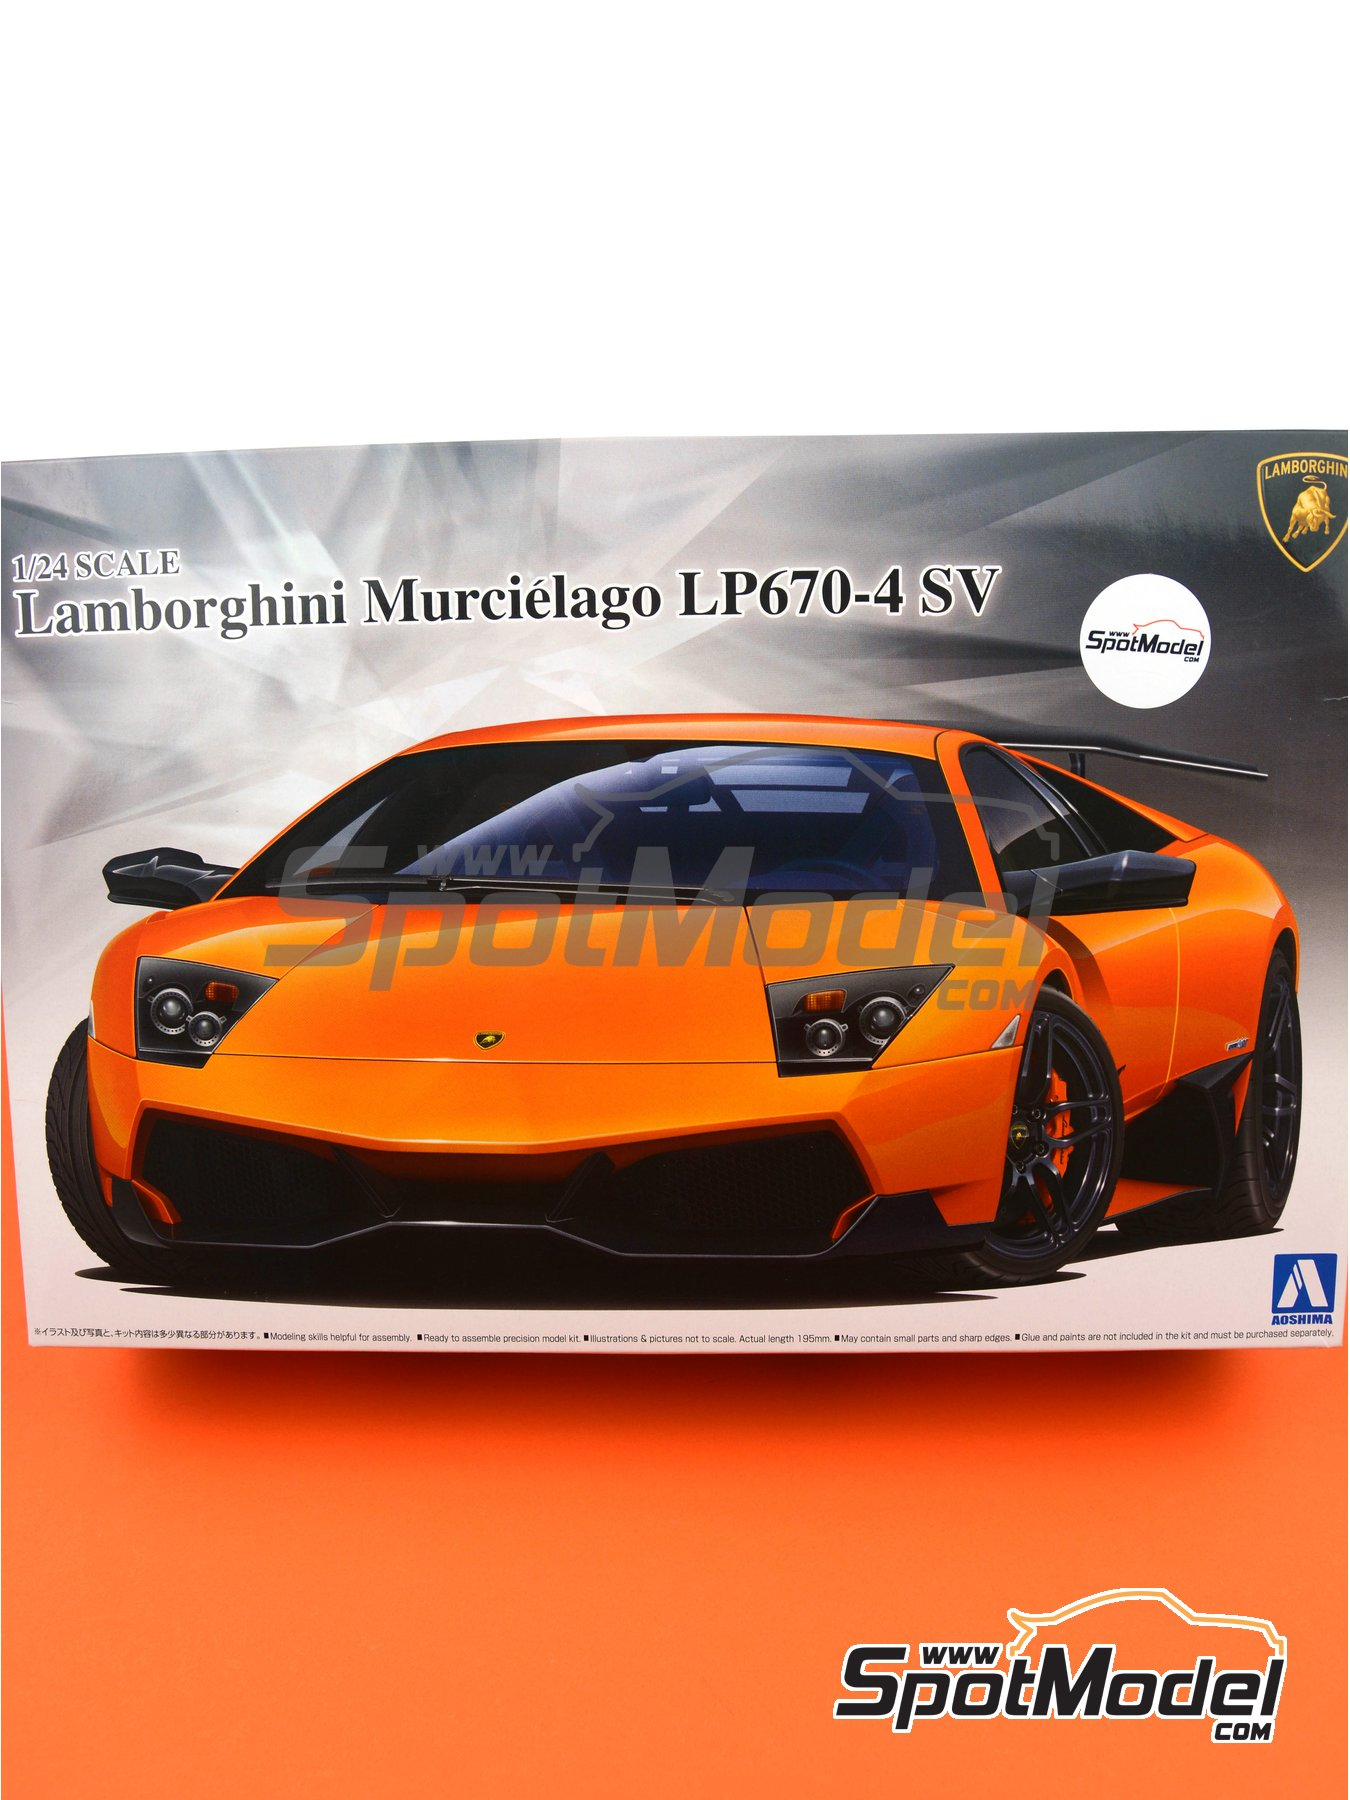 Lamborghini Murcielago LP670-4 SV SuperVeloce | Model car kit in 1/24 scale manufactured by Aoshima (ref.007068, also 07068) image